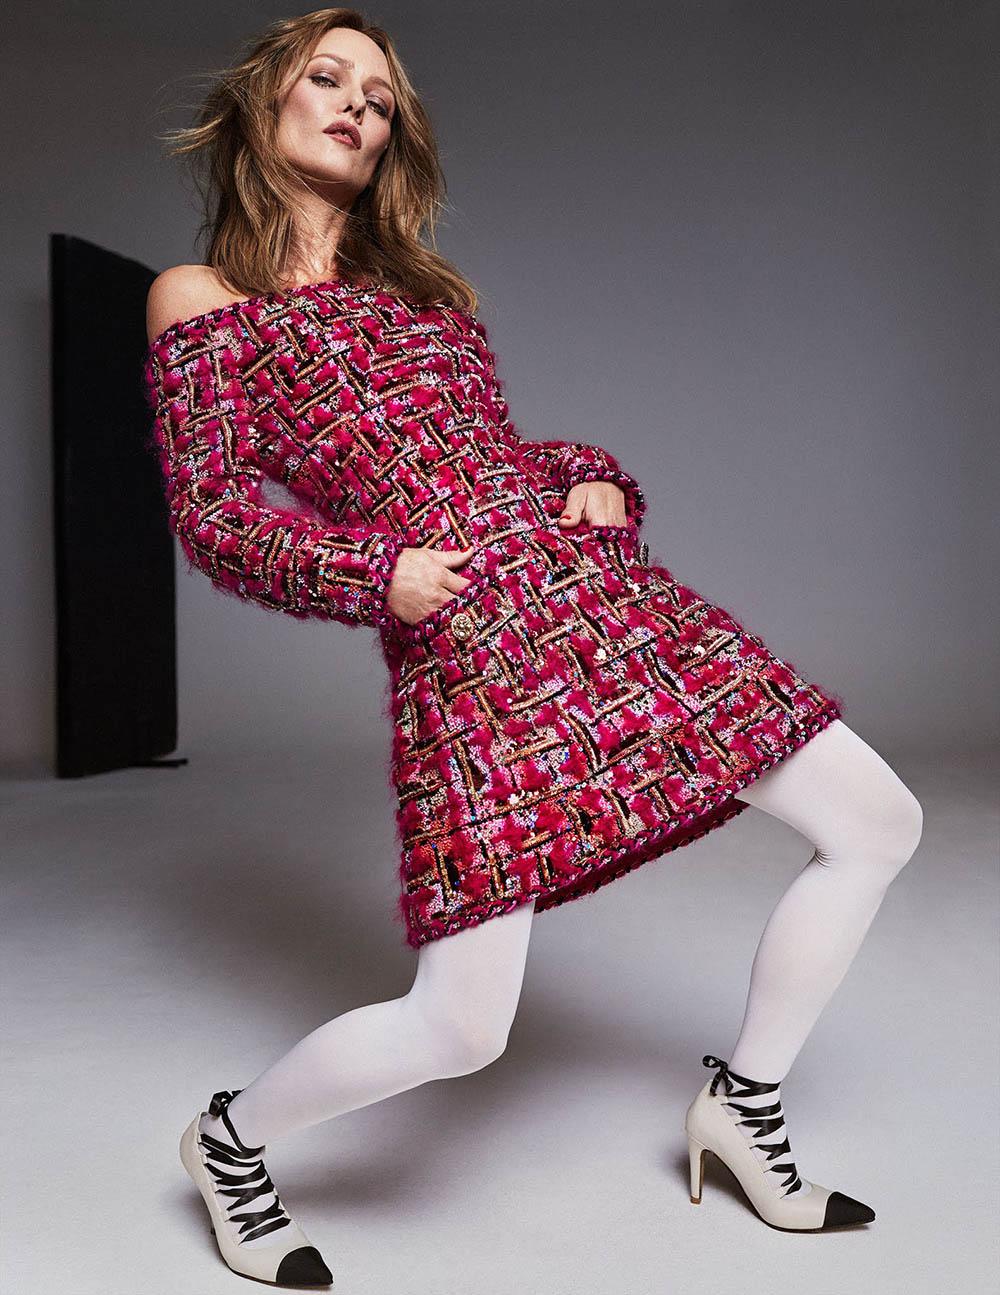 Vanessa Paradis covers Harper's Bazaar Spain December 2020 by Xavi Gordo